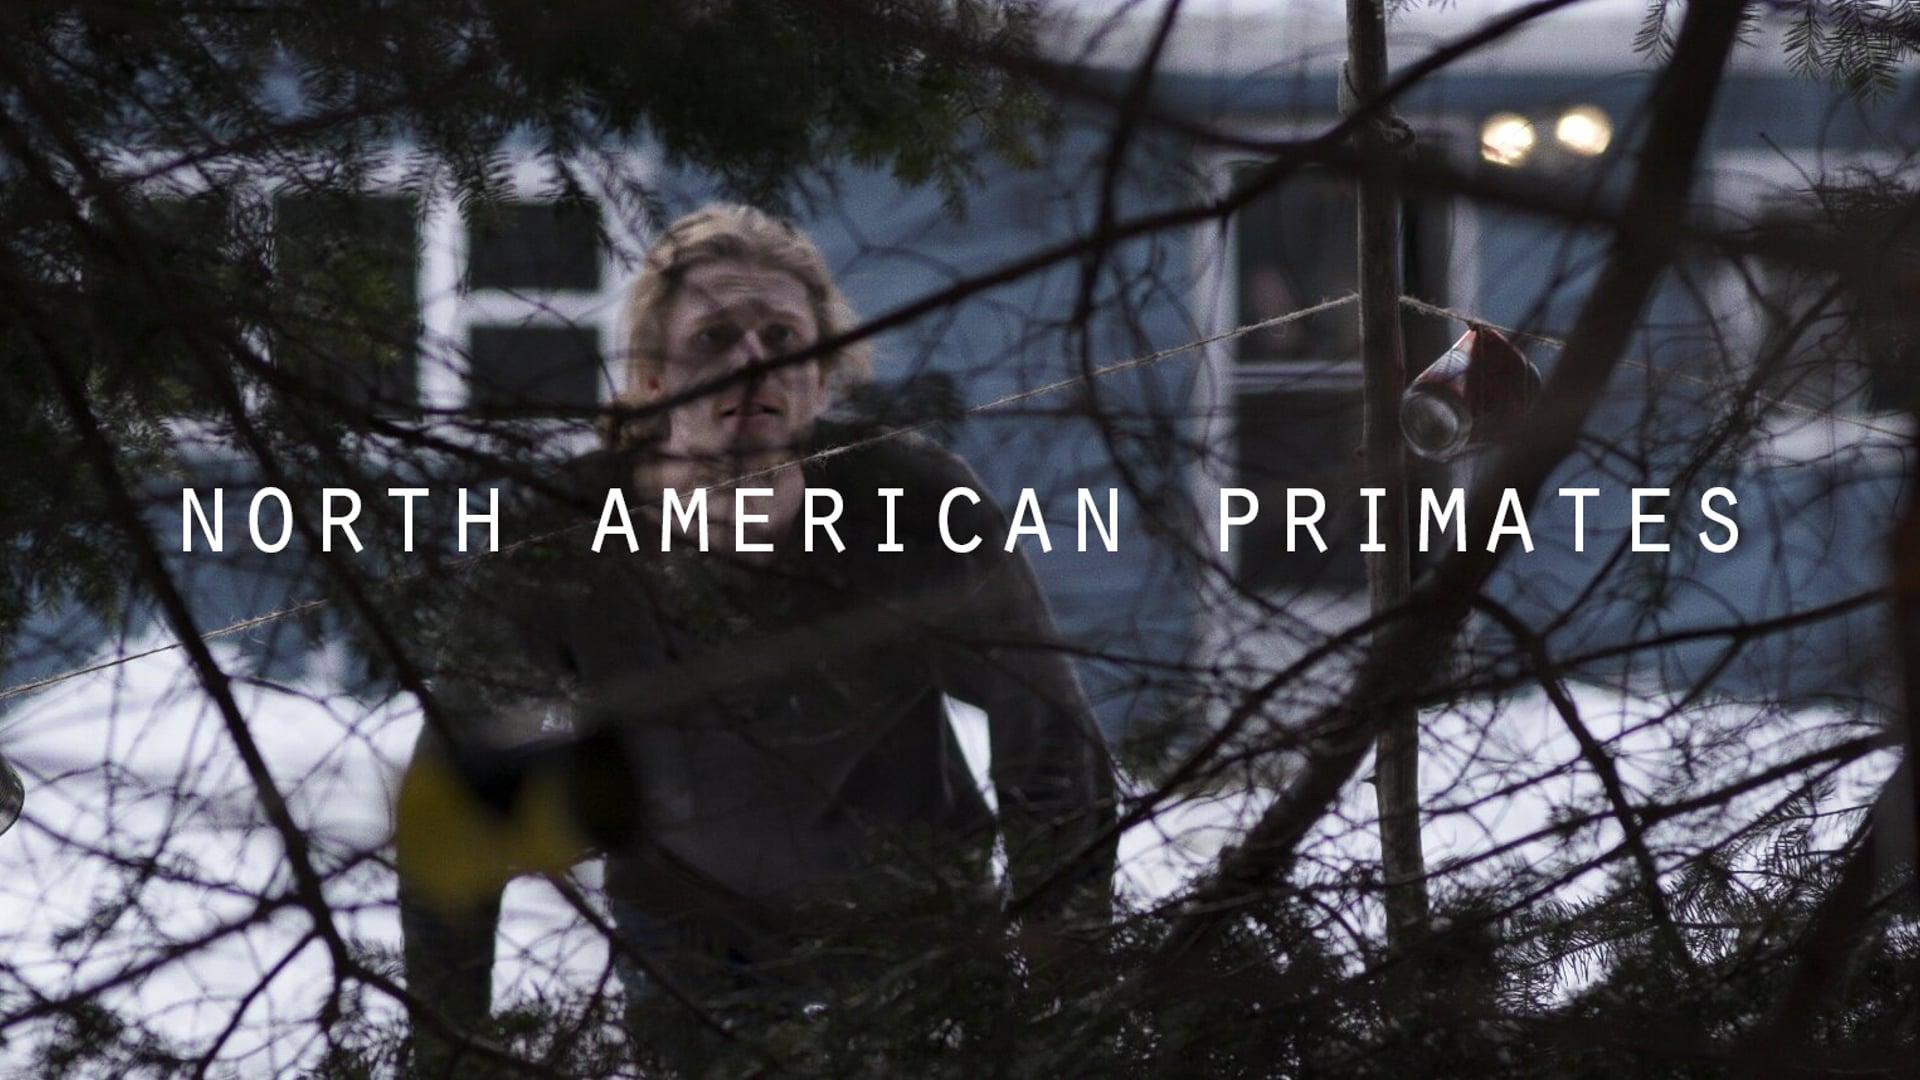 North American Primates (2017)